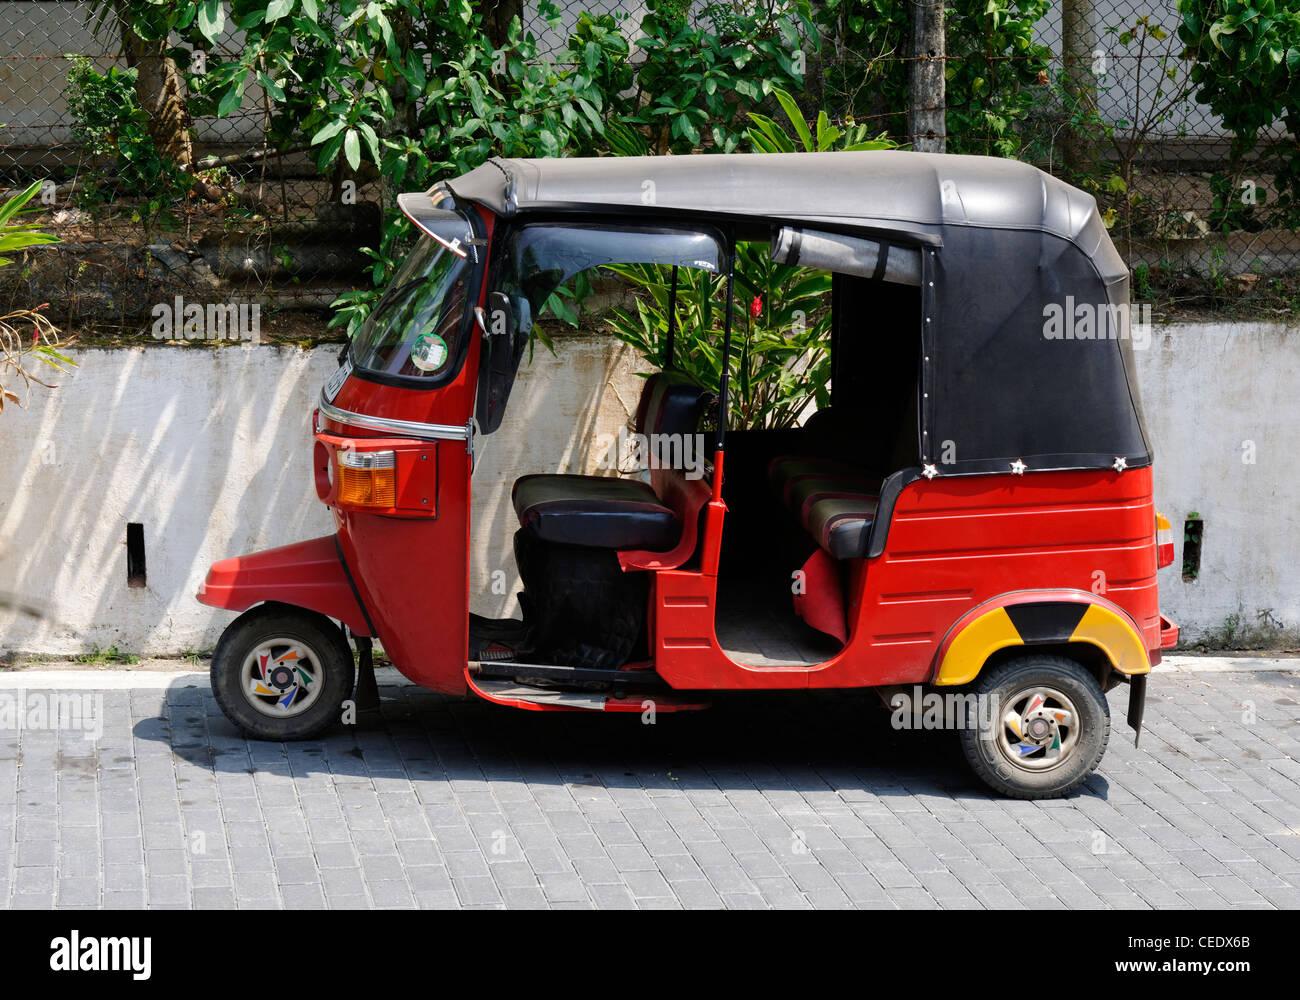 A parked tut tut - taxi transport in Galle, Sri Lanka - Stock Image